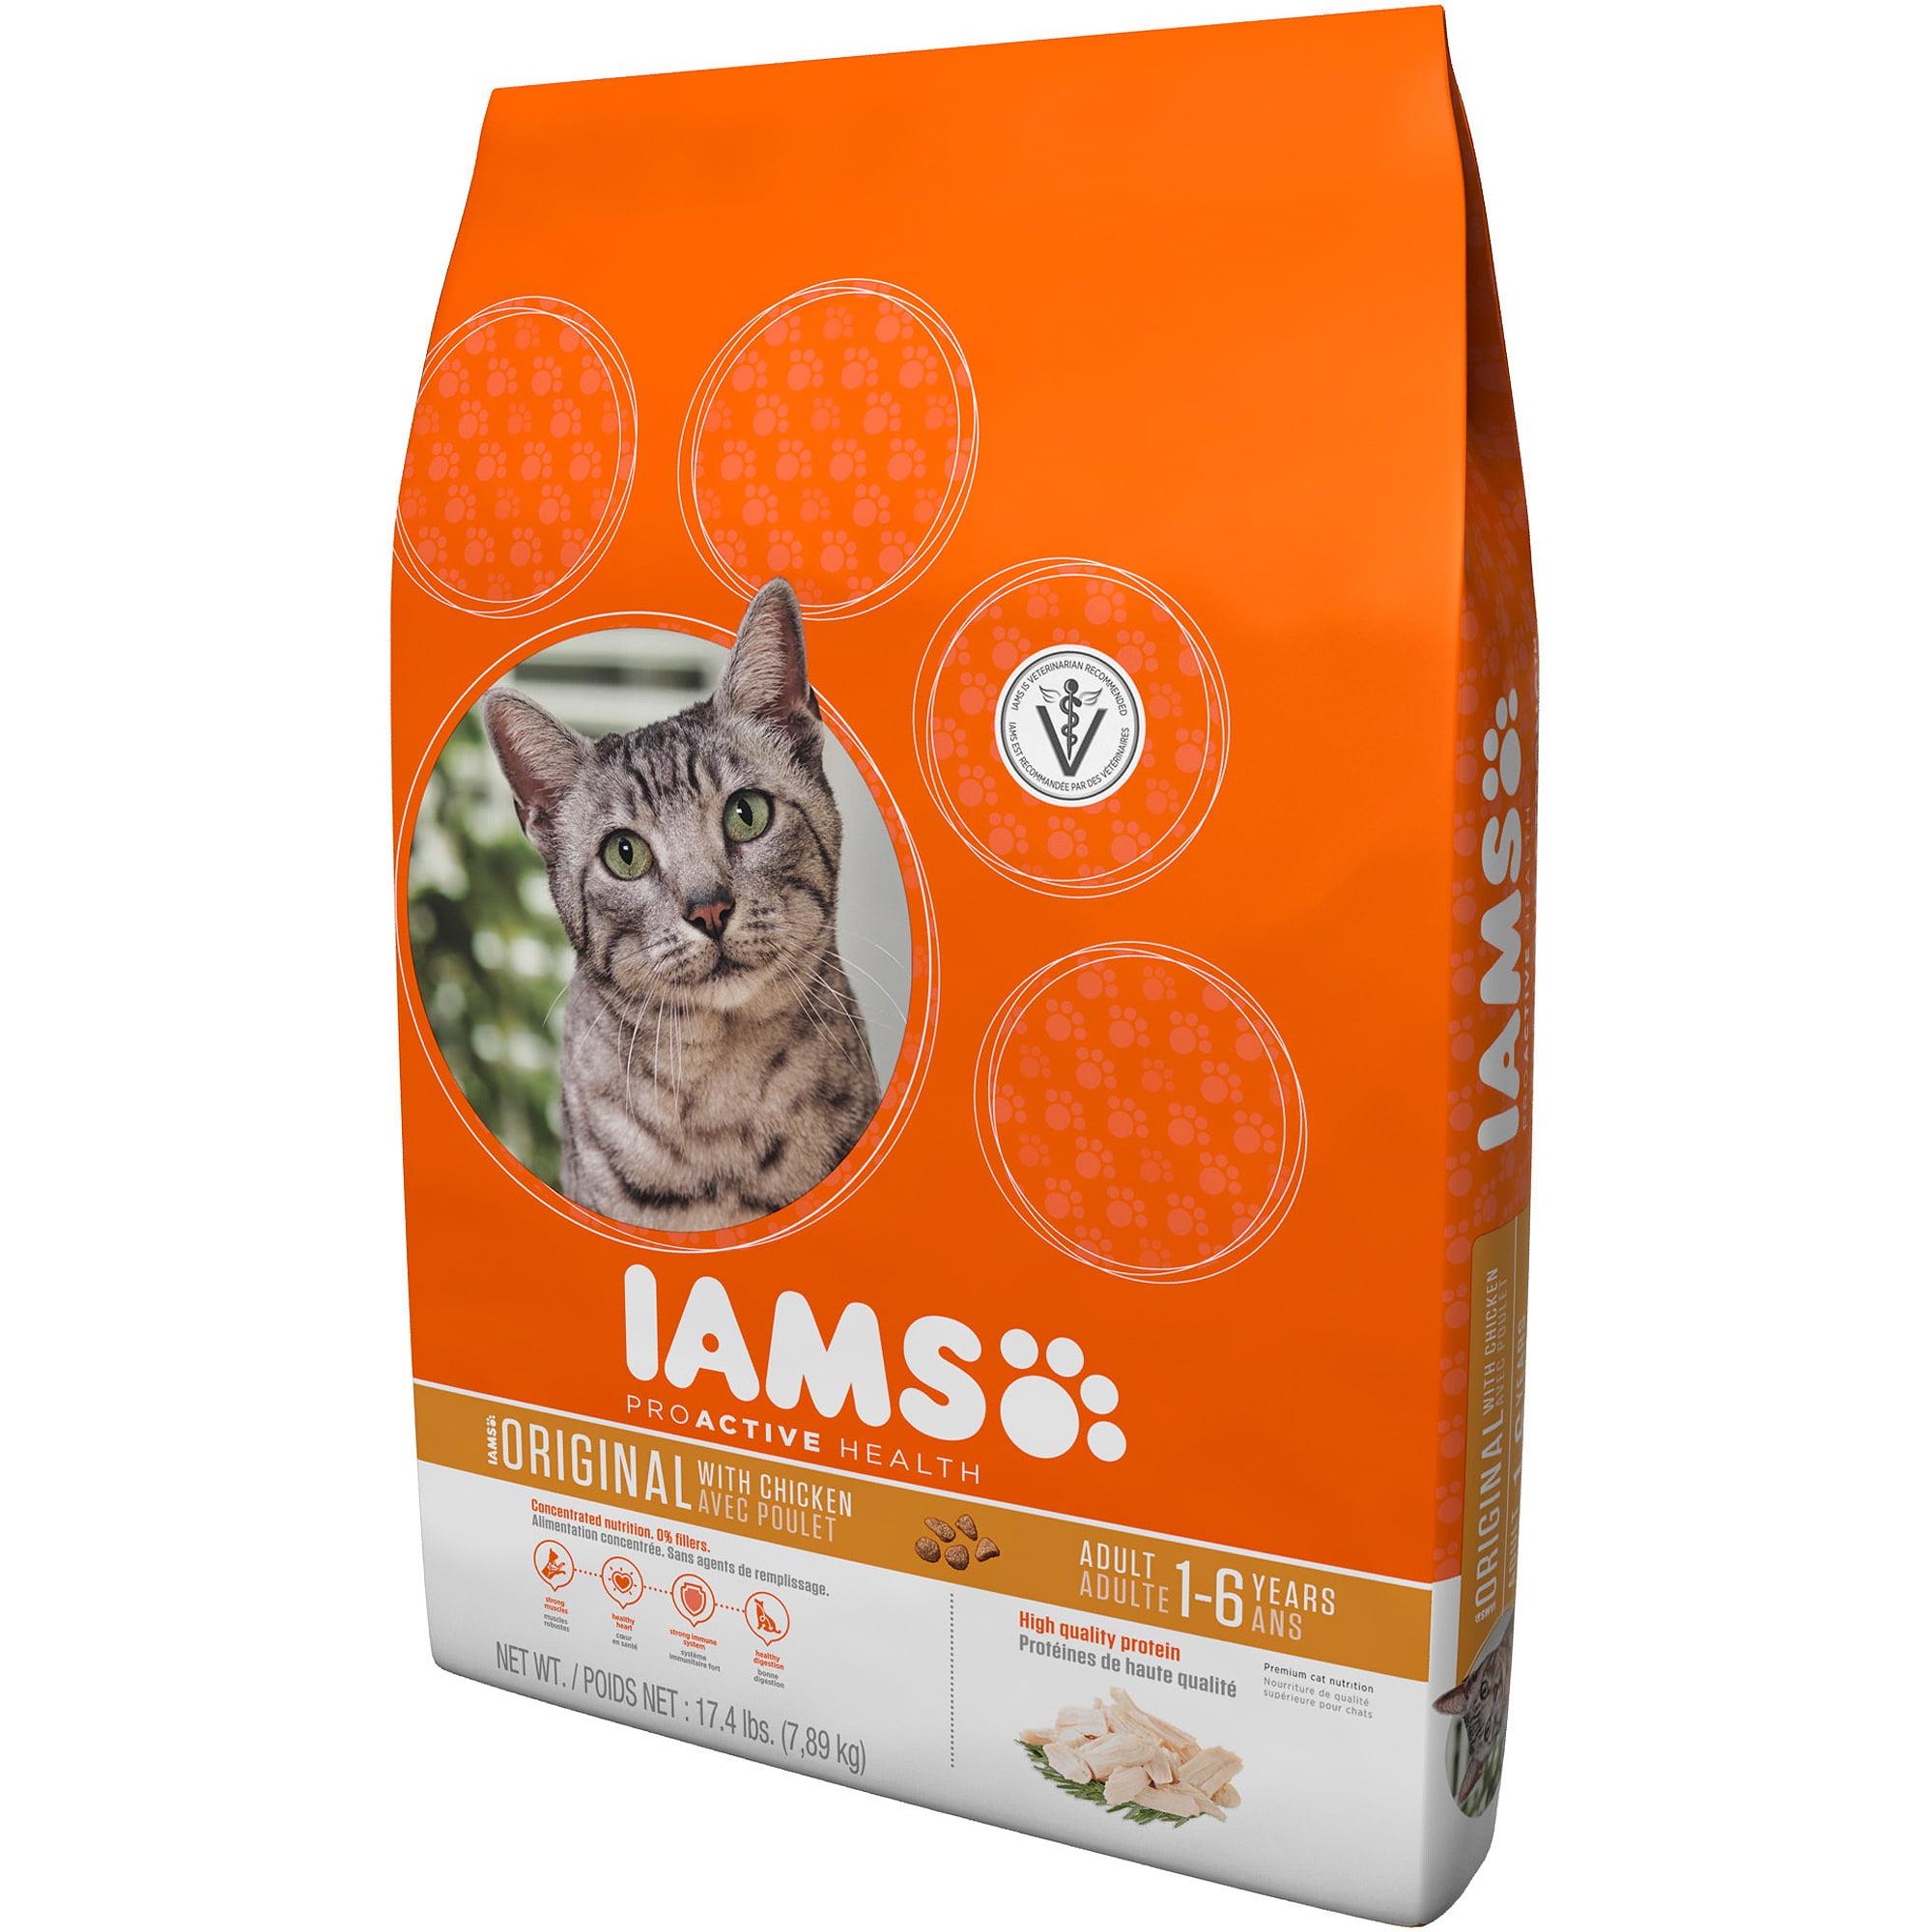 IAMS ProActive Health Adult Original with Chicken Walmart